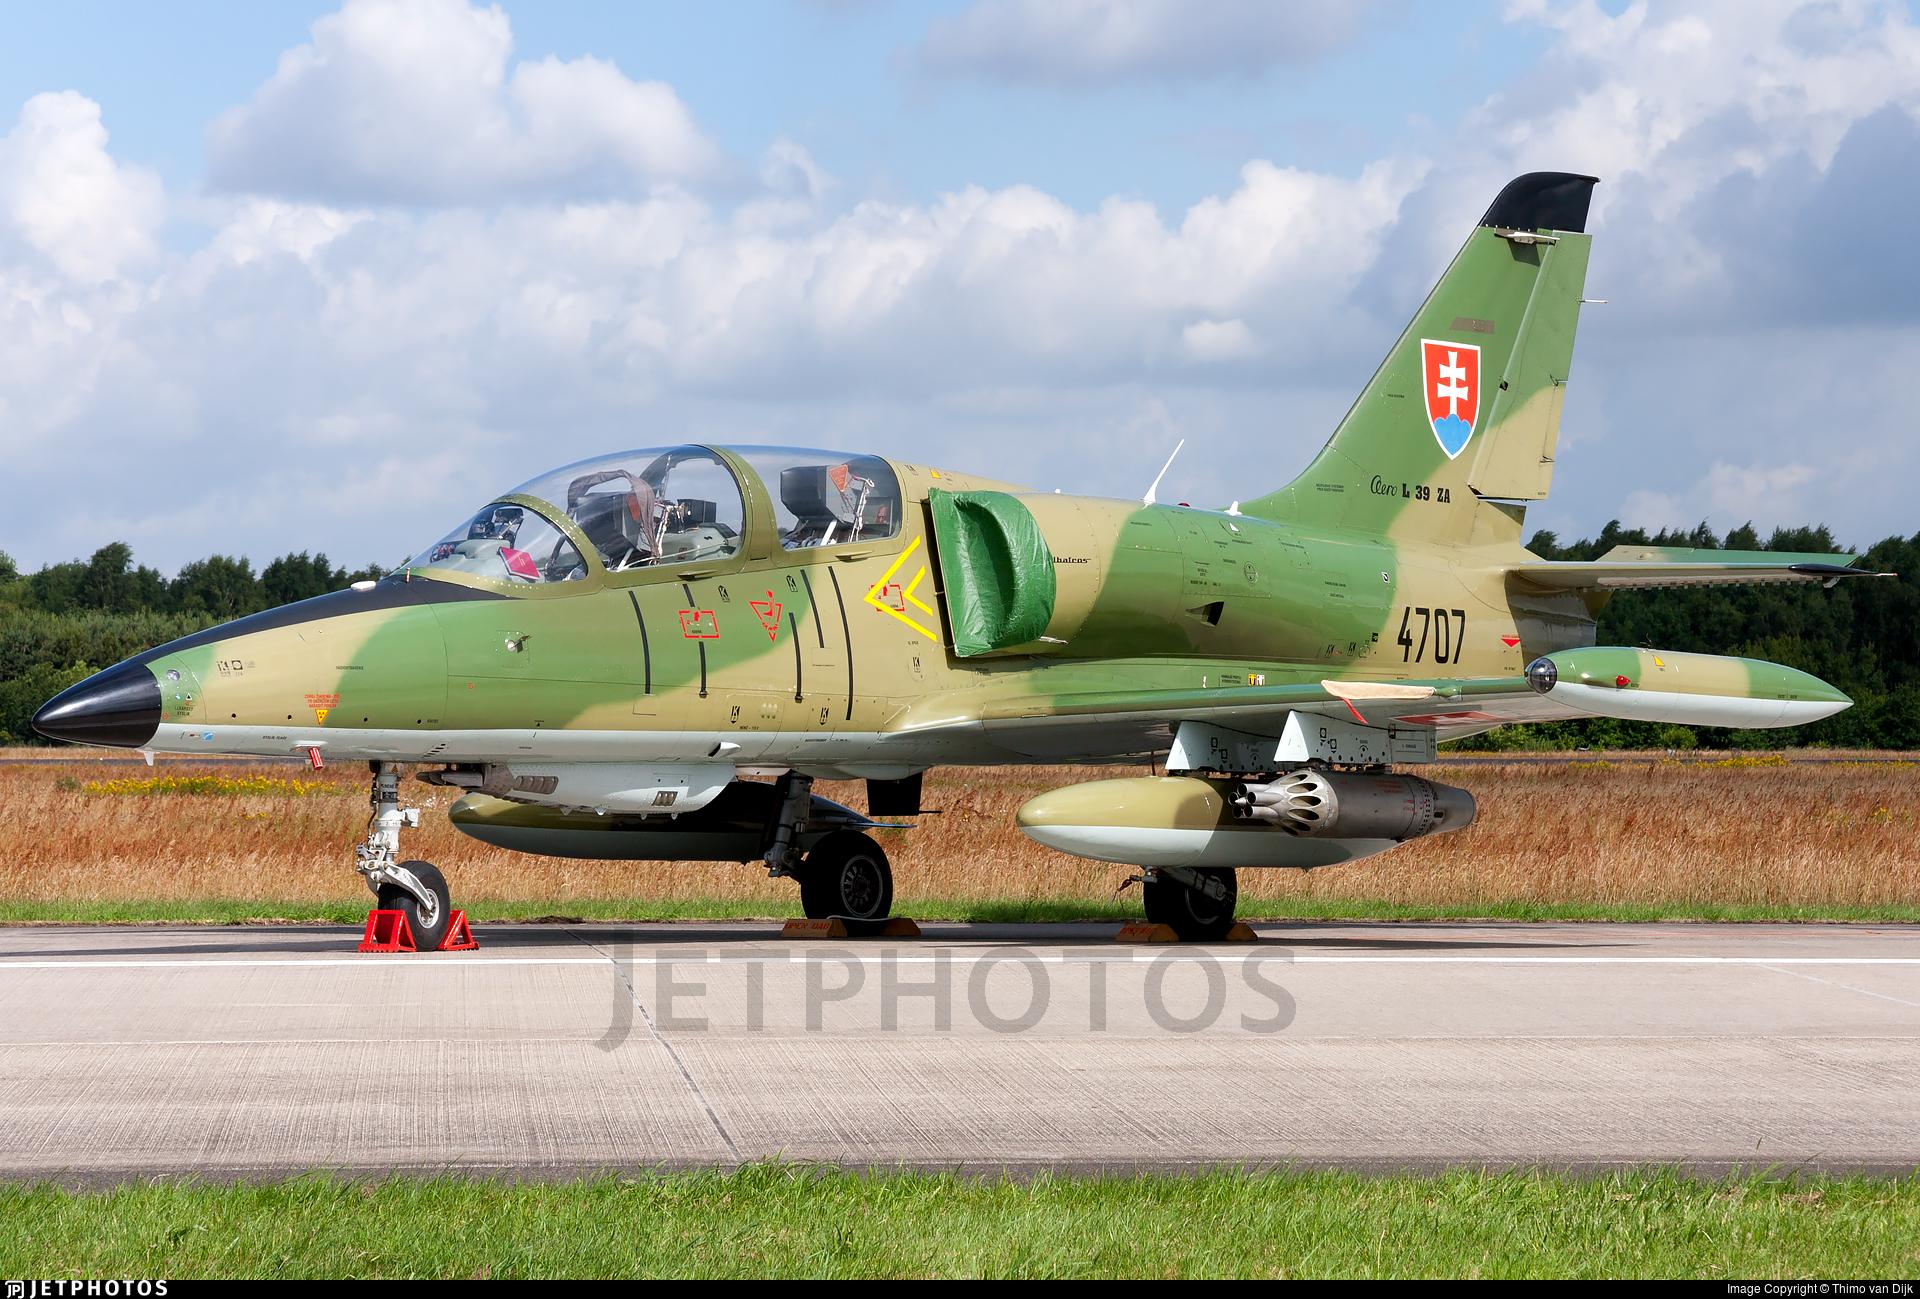 4707 - Aero L-39ZA Albatros - Slovakia - Air Force